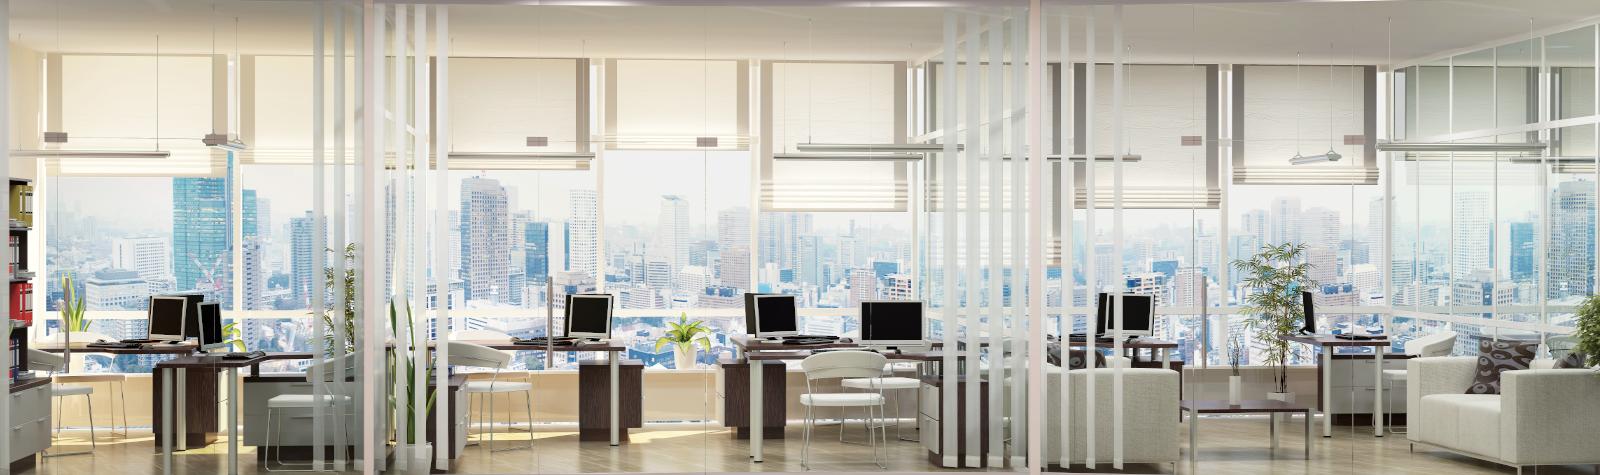 Office Ergonomics Checklist for Employees